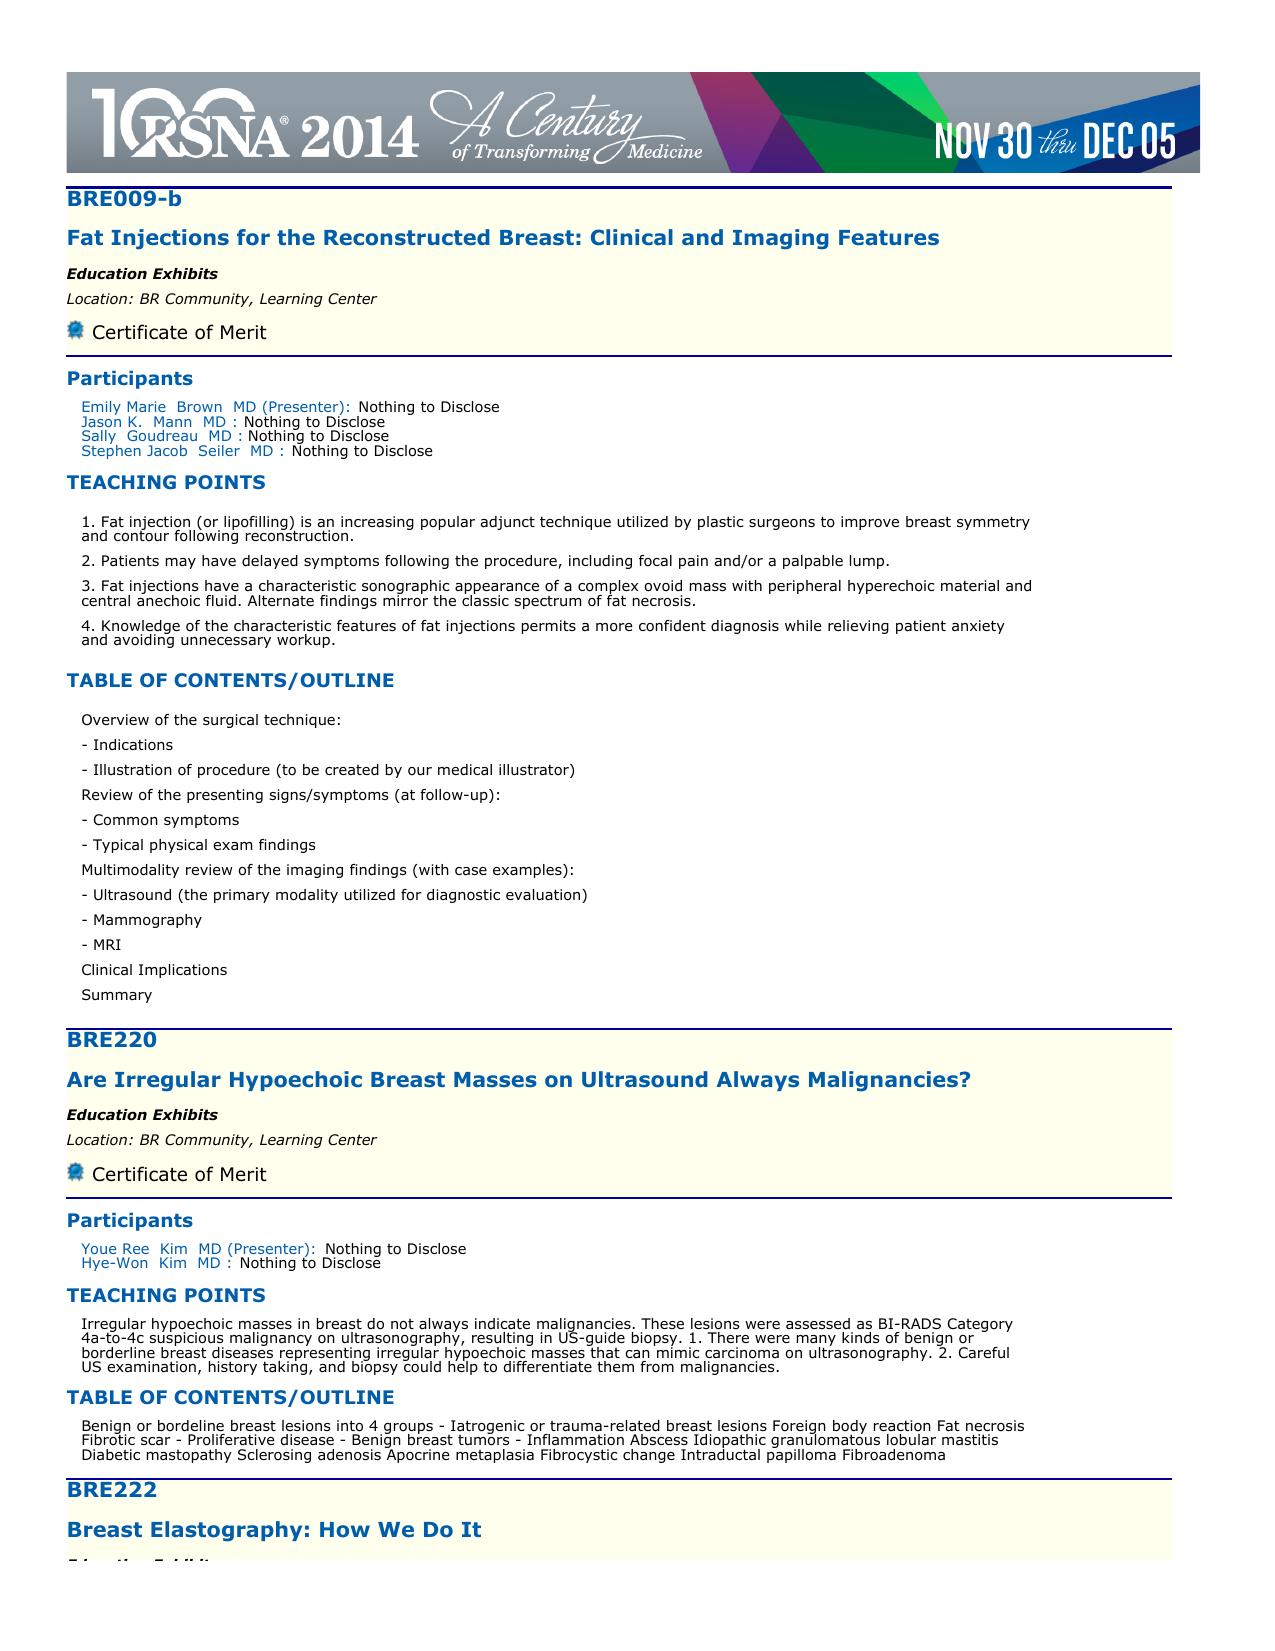 Ultrasound - RSNA 2014 - Radiological Society of North America